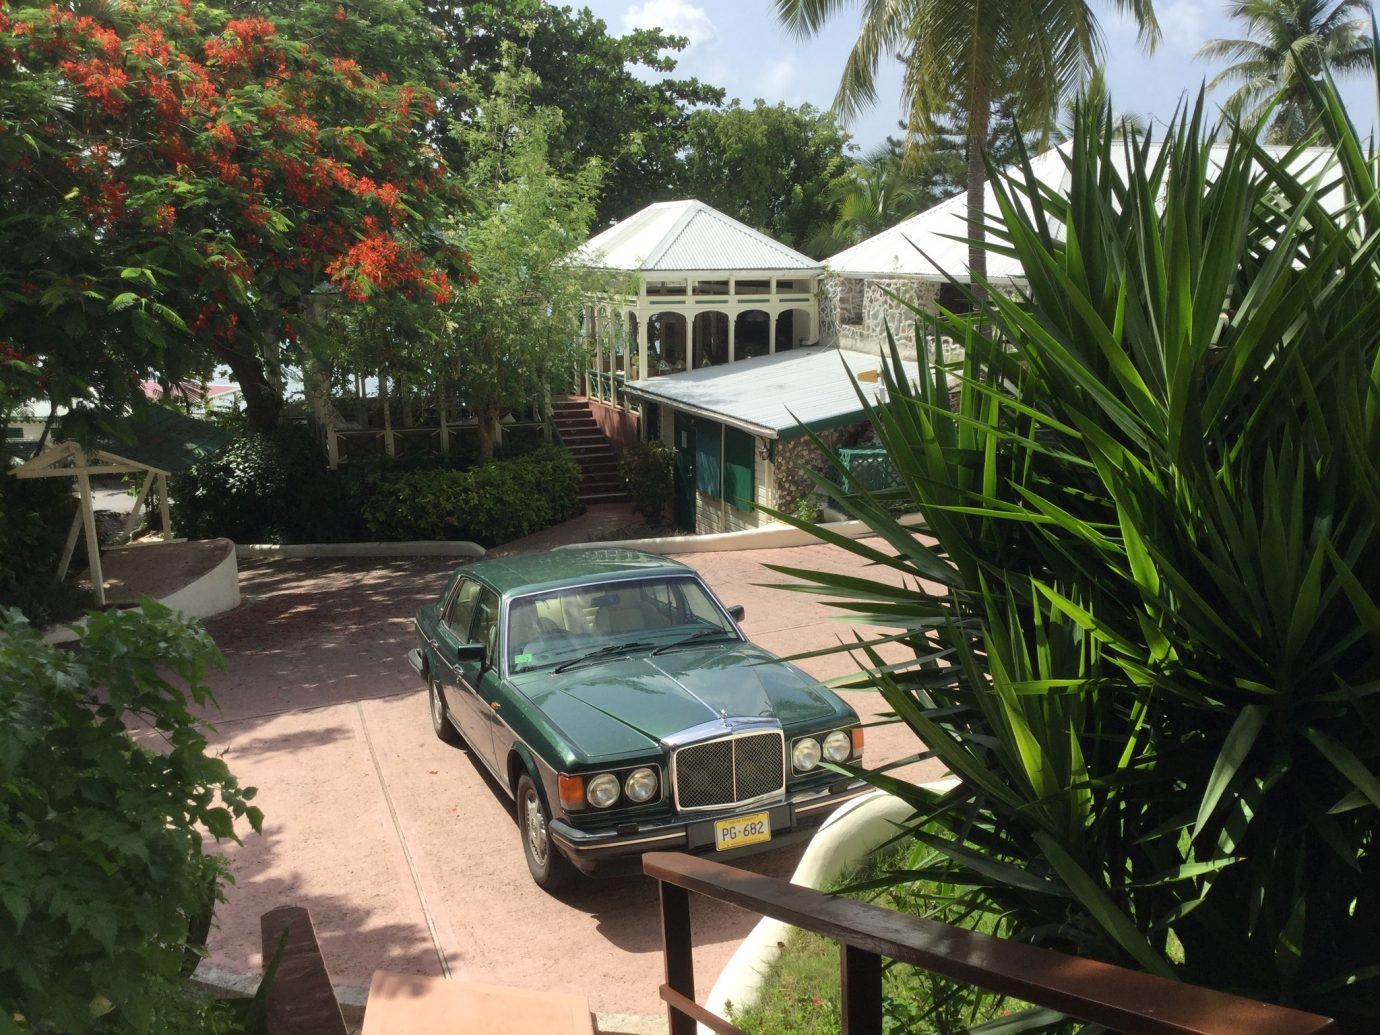 car in driveway in tropical setting